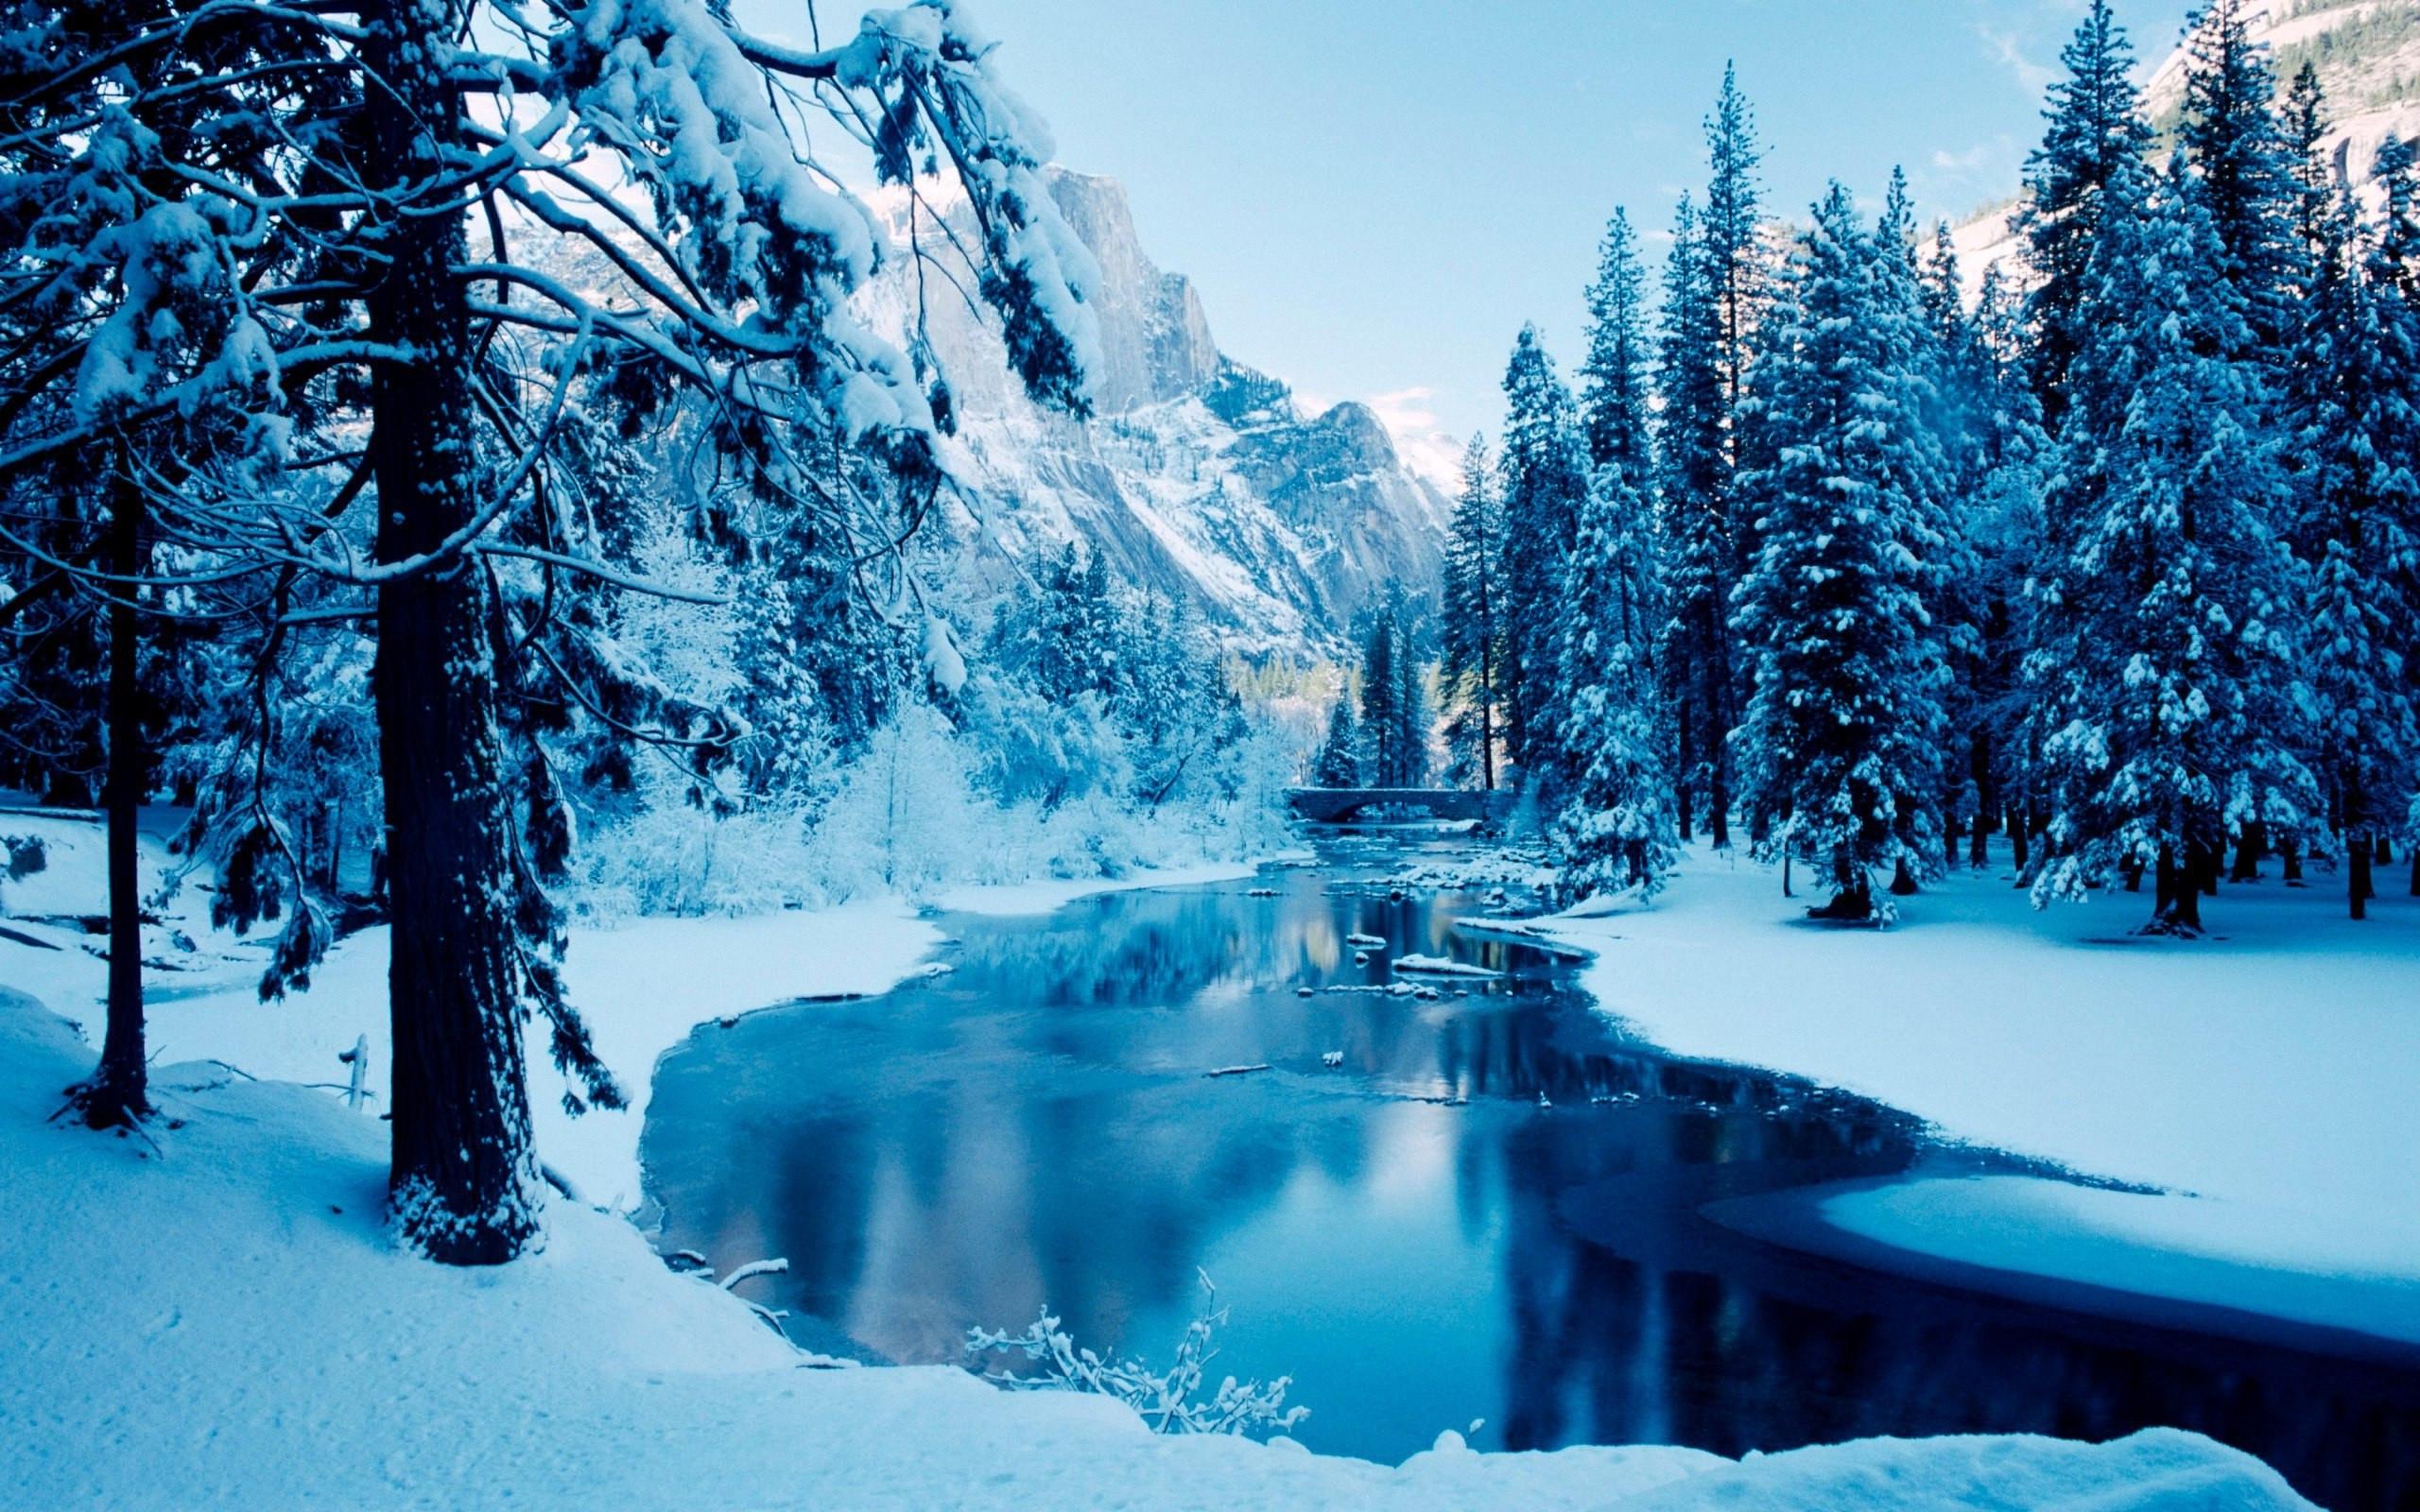 winter scene desktop background (56+ images)